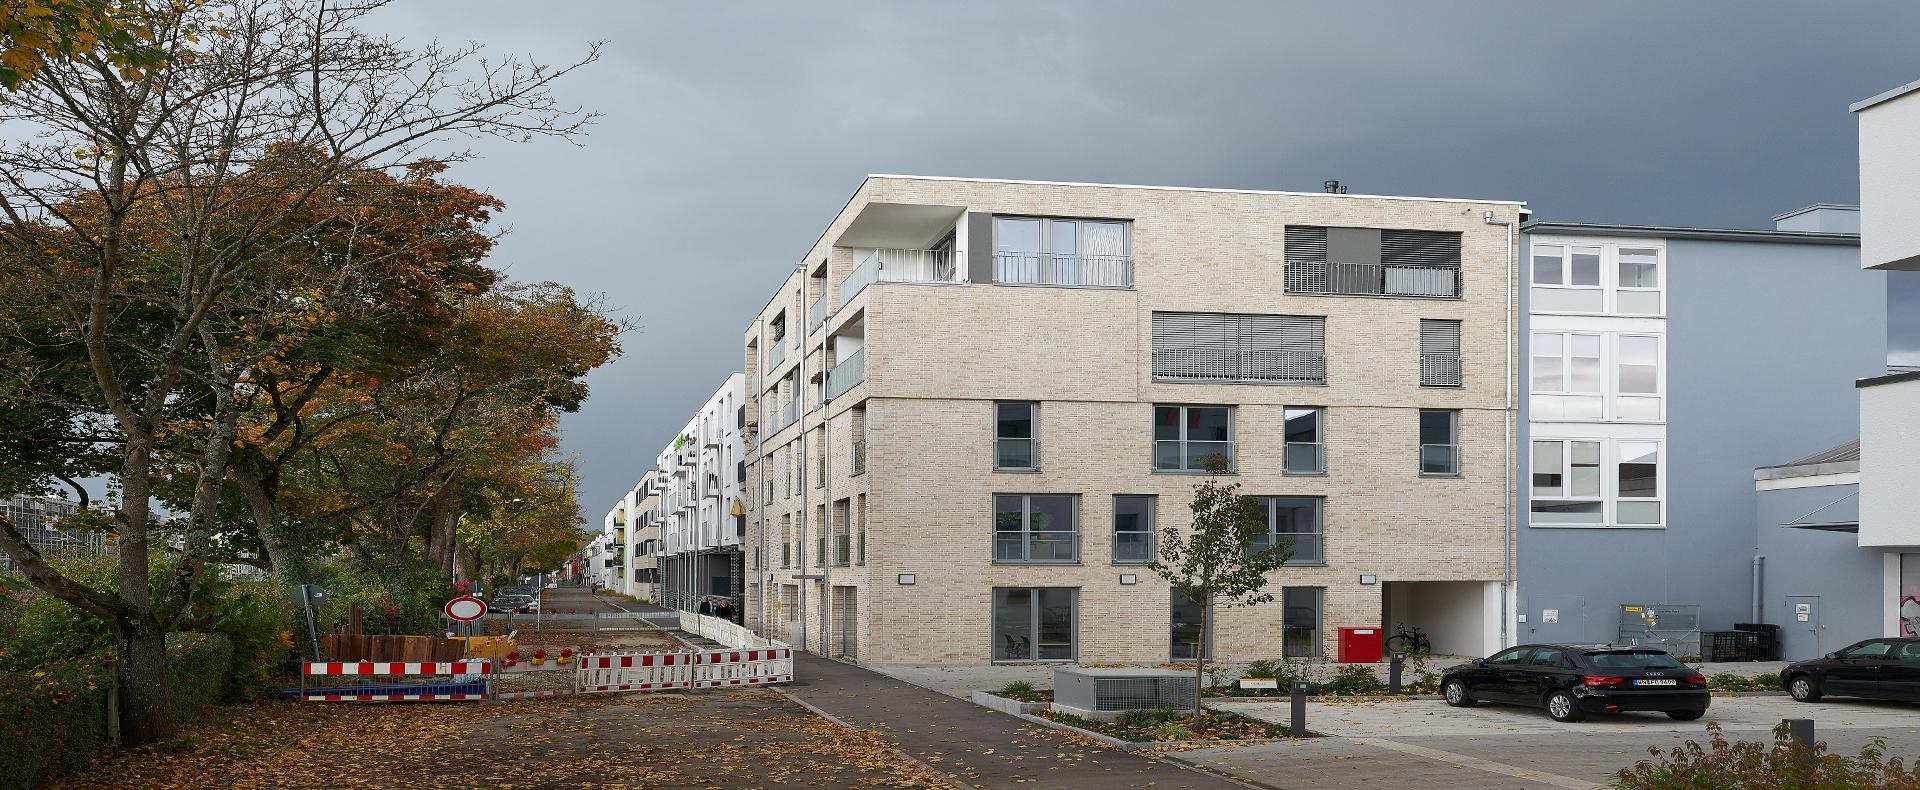 e+k architekten_Bismarckstrasse_0041_web1920